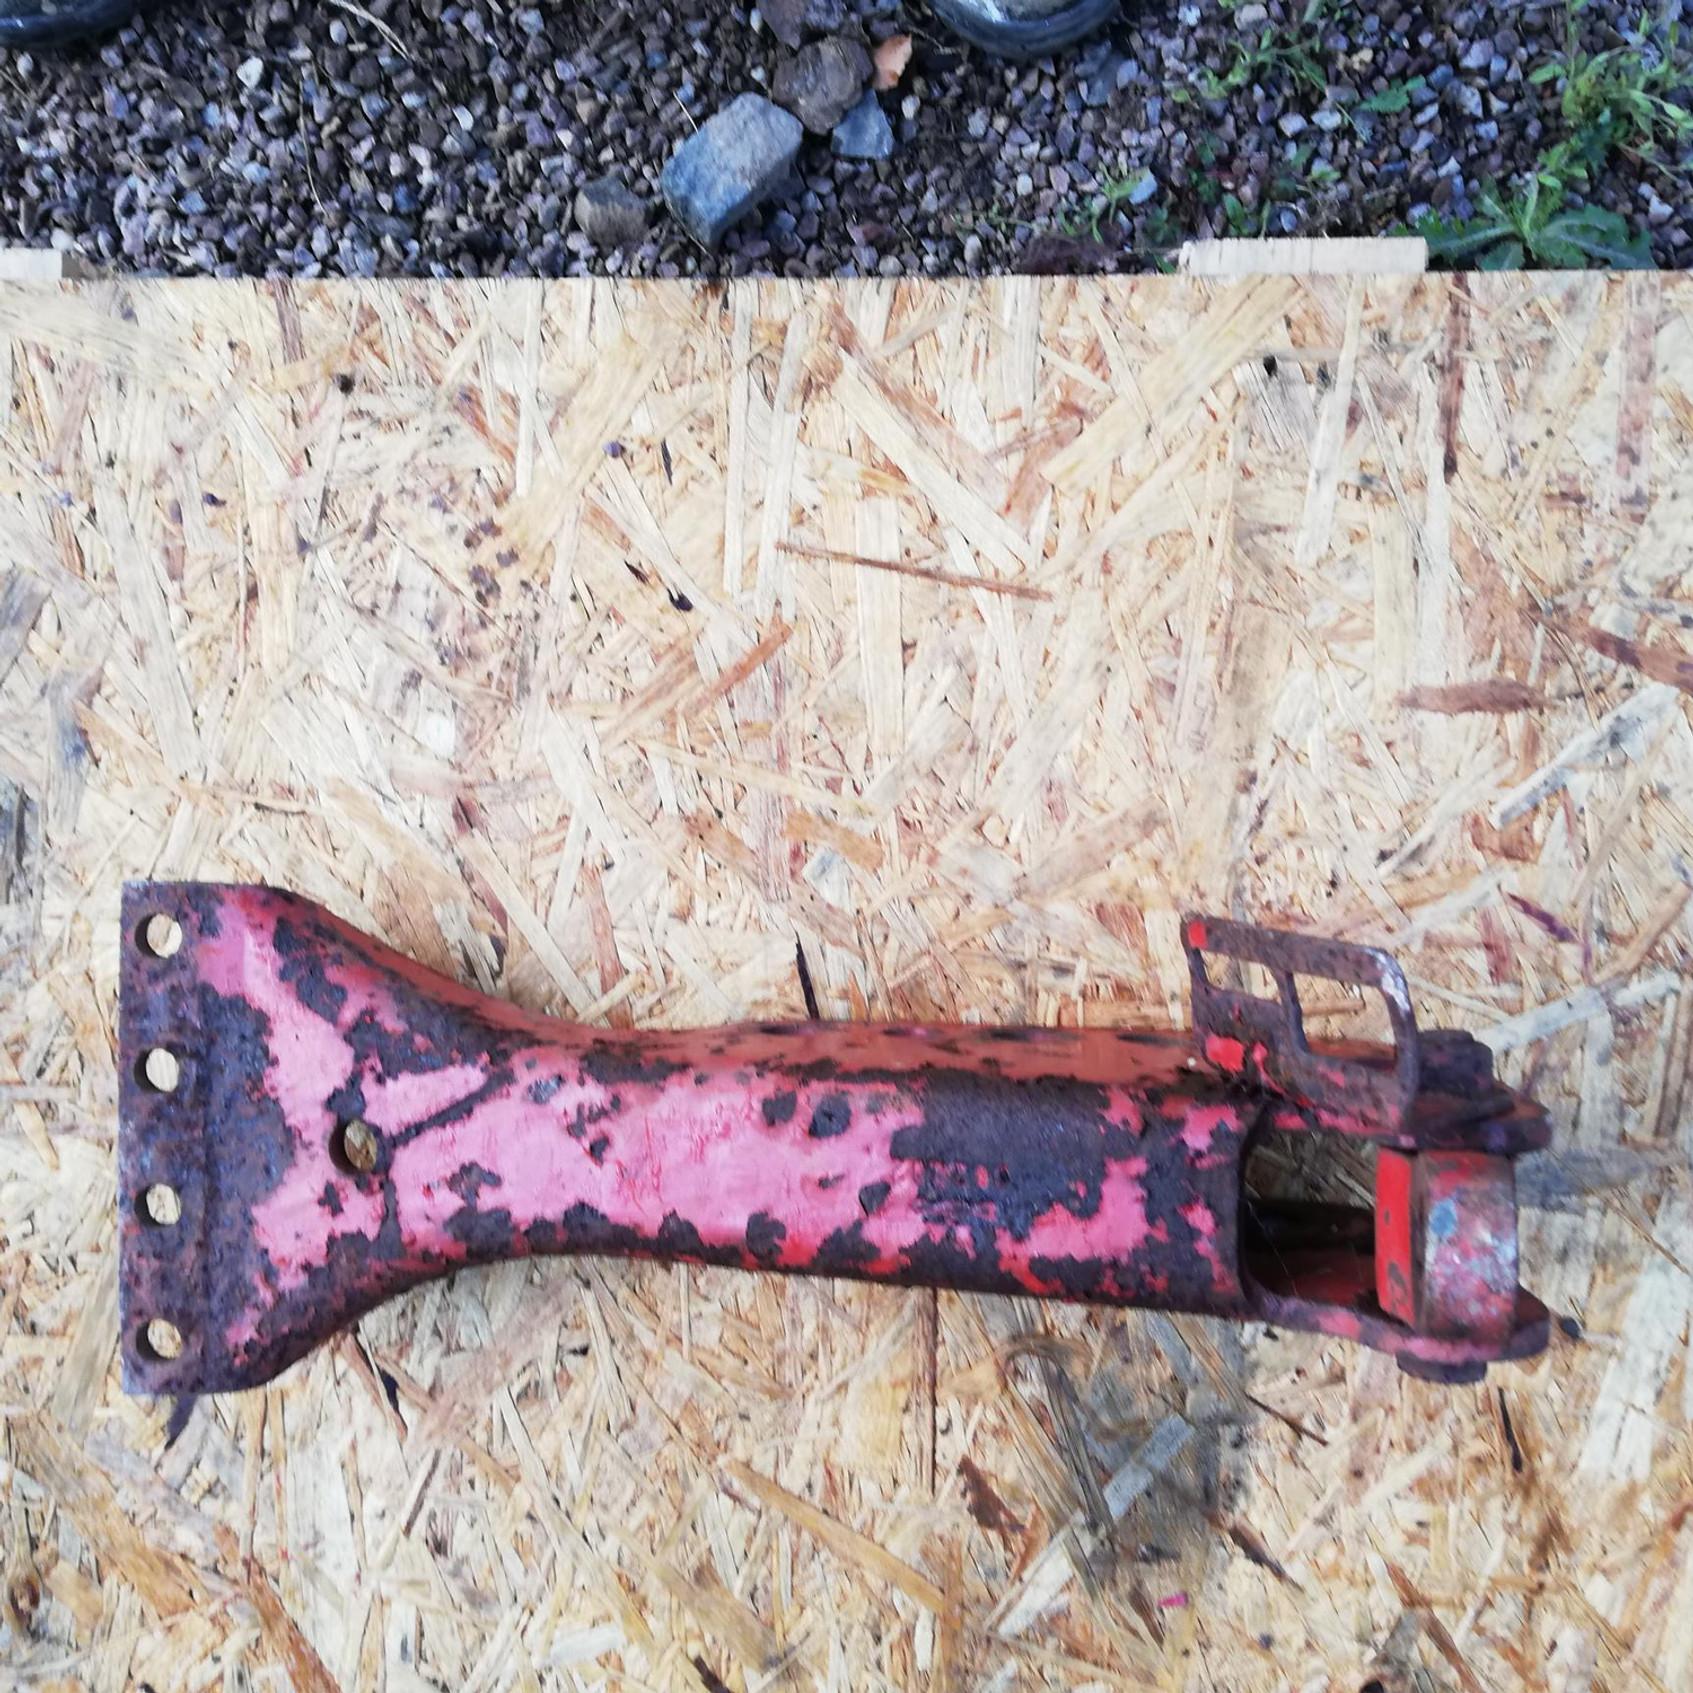 Kvernalnd conventional plough headstock £55.00 plus vat